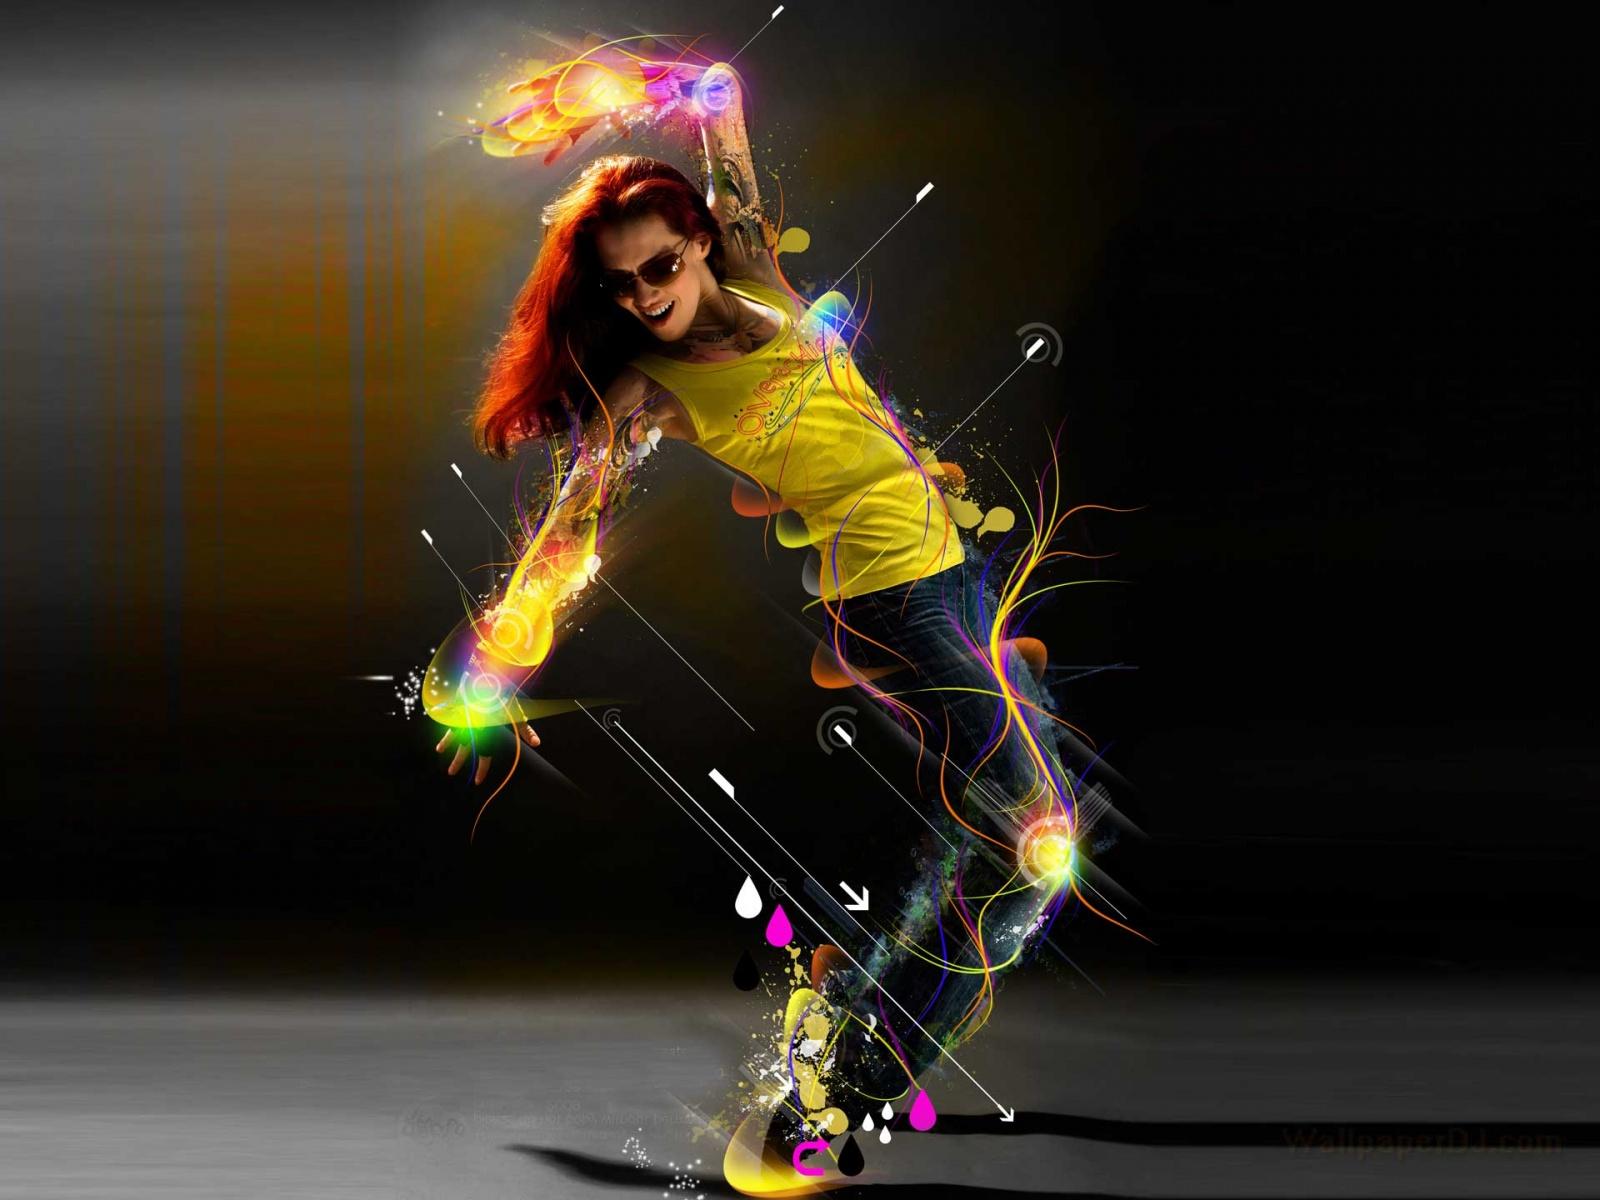 step_up_to_street_dance-1600x1200.jpg